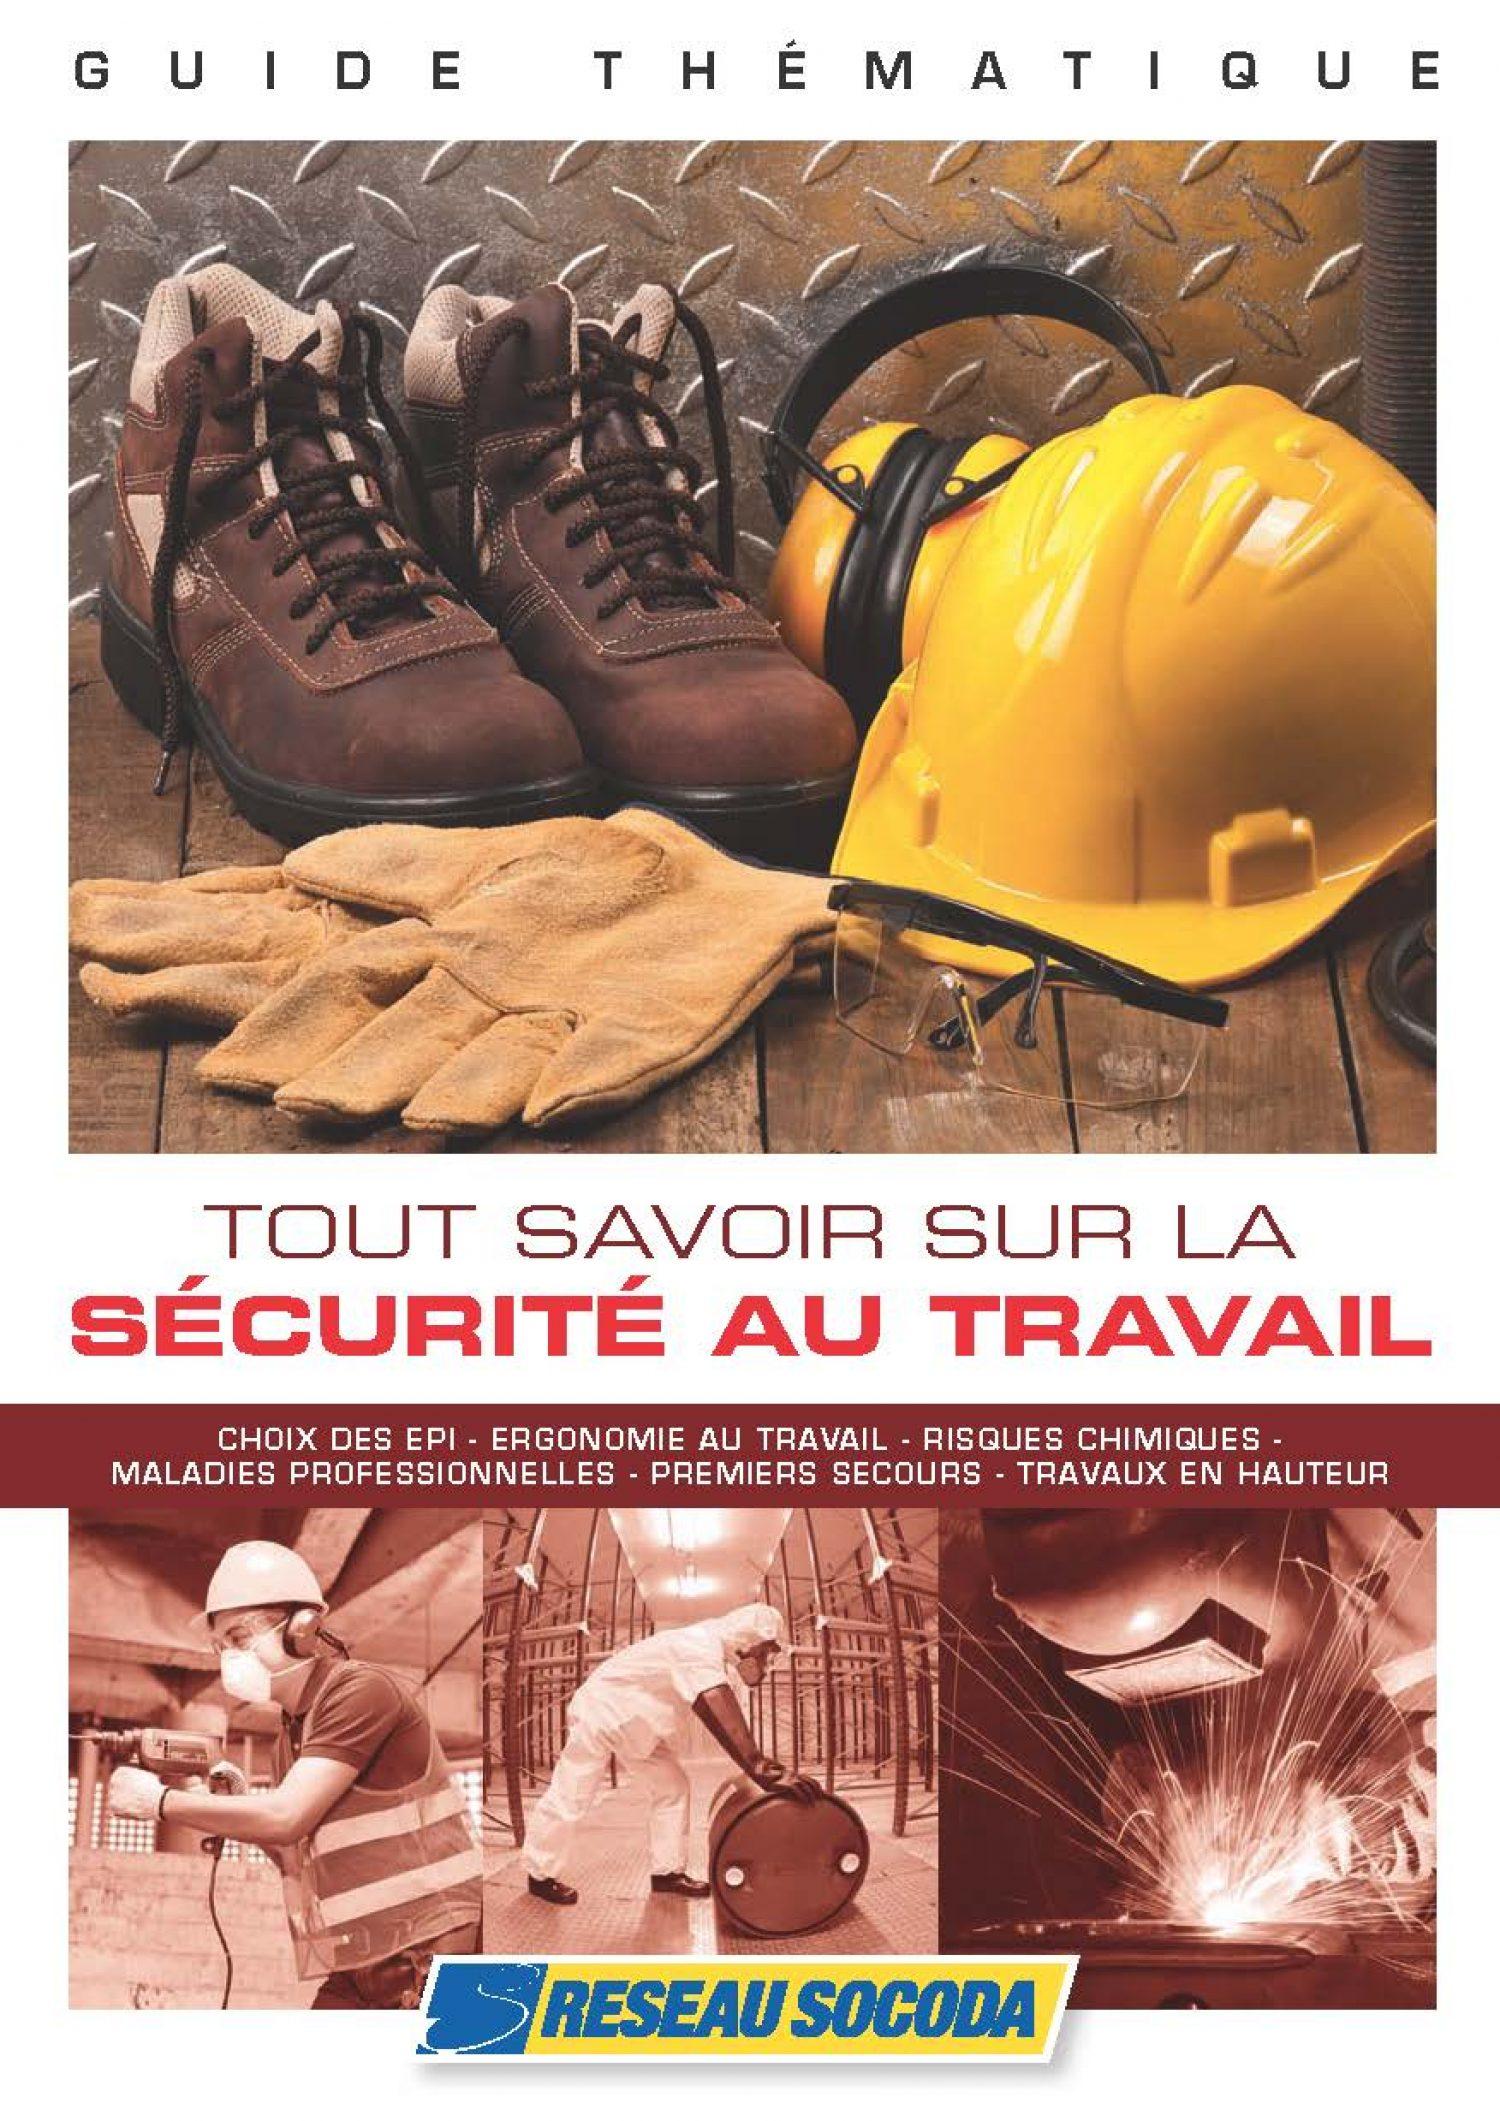 Guide Securite au Travail 2014 HDpdf_Page_01